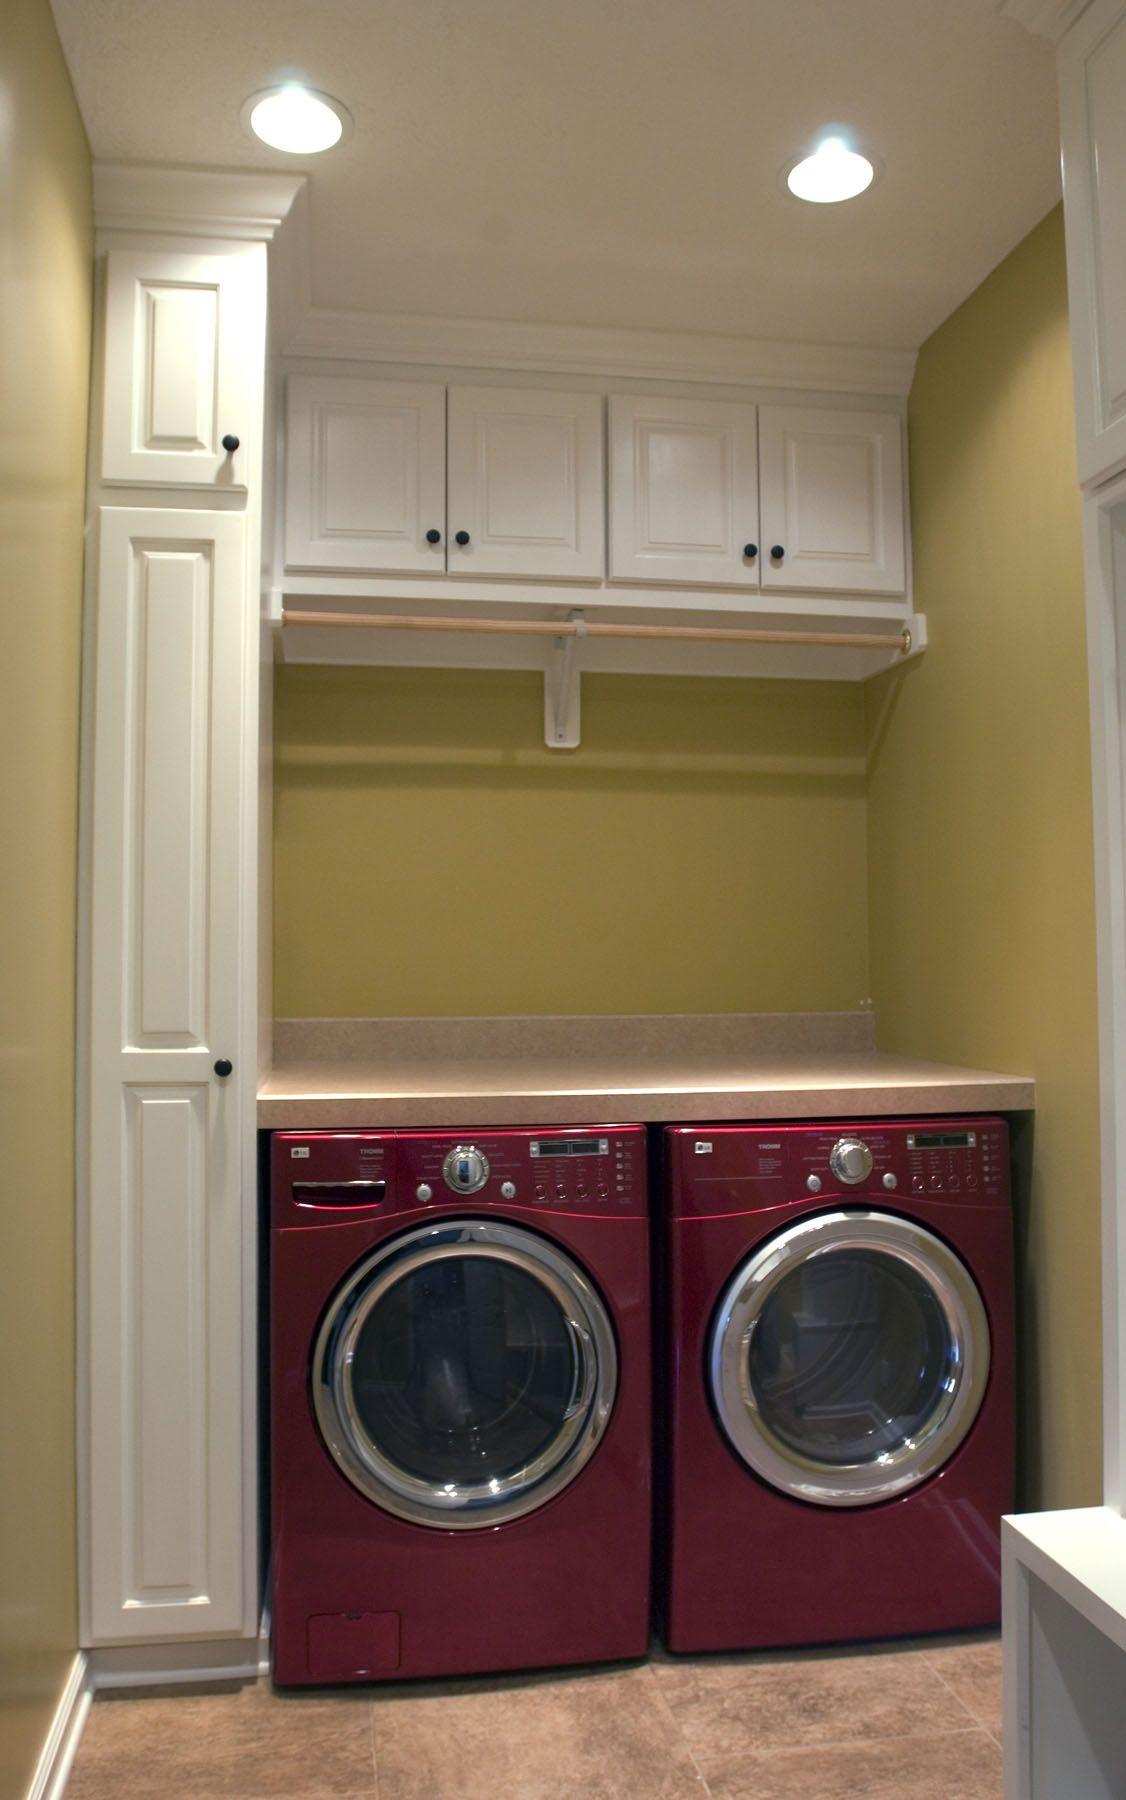 Laundry Room Makeover Laundry Room Diy Laundry Room Layouts